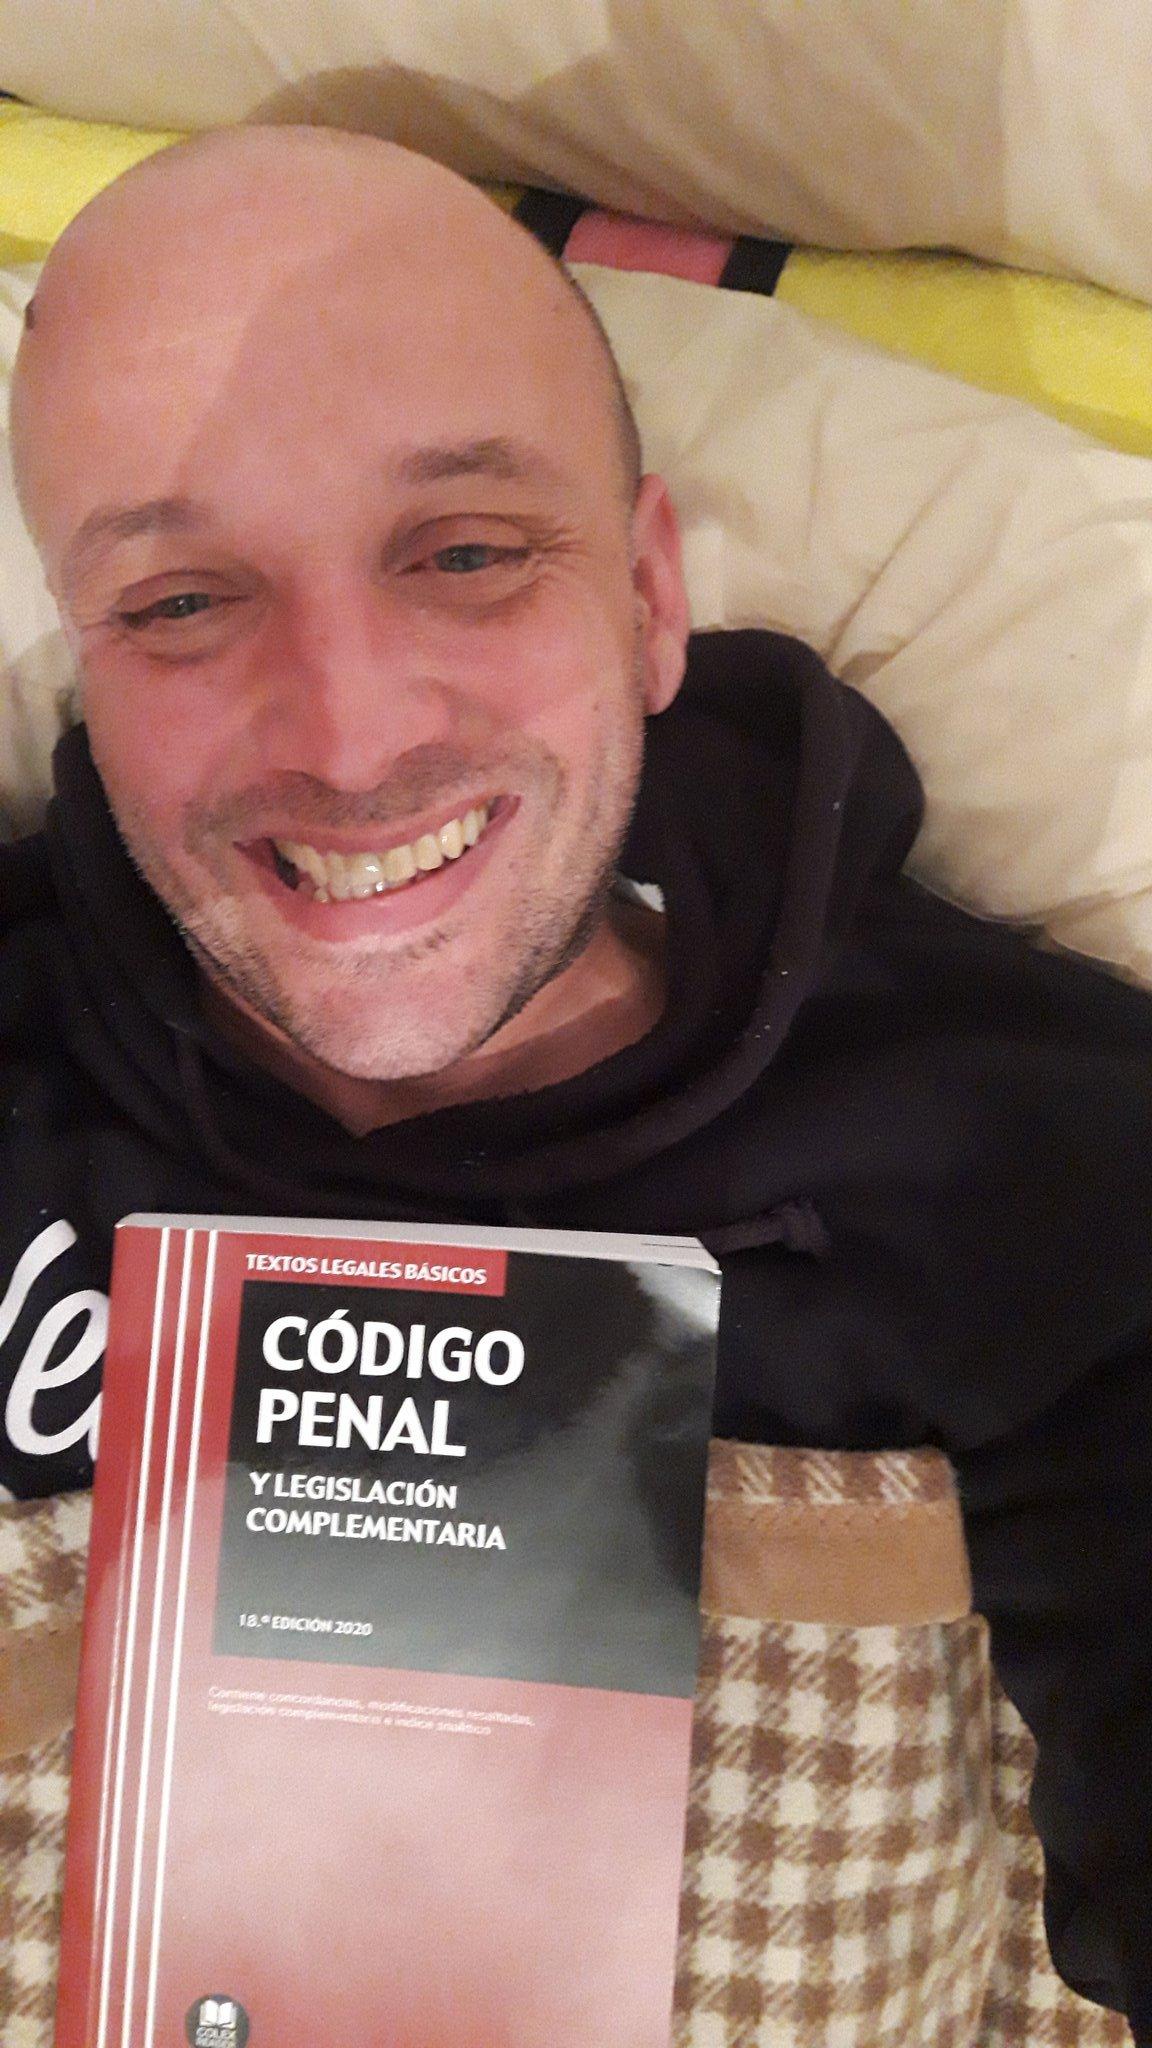 Spanish penal code